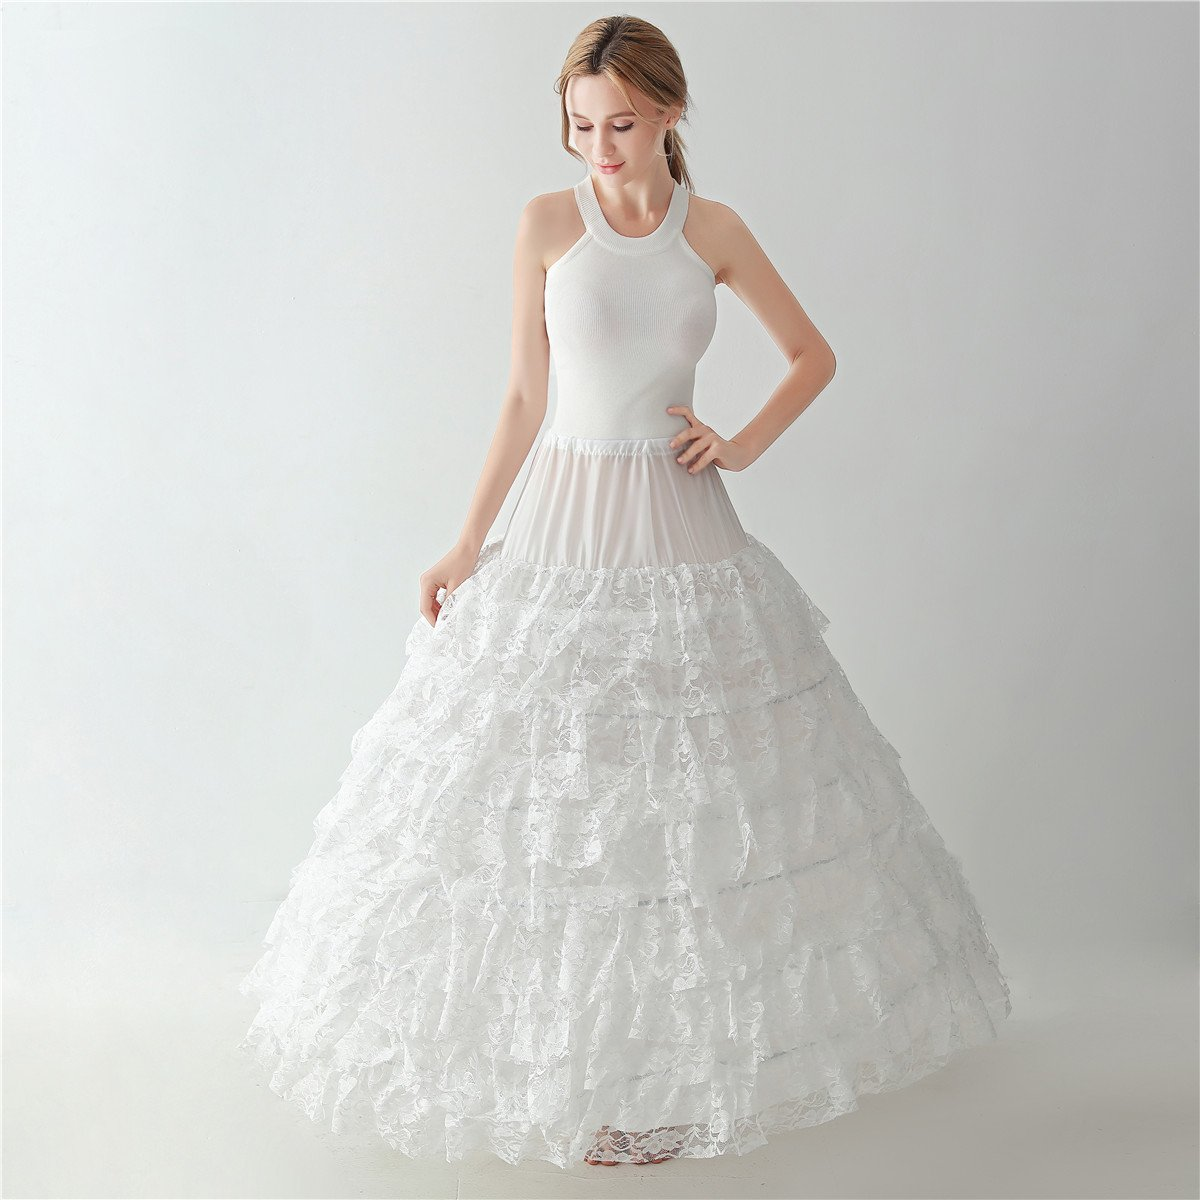 Women Full Length Lace 6 Hoop Skirt Petticoat Wedding Sandals Prom